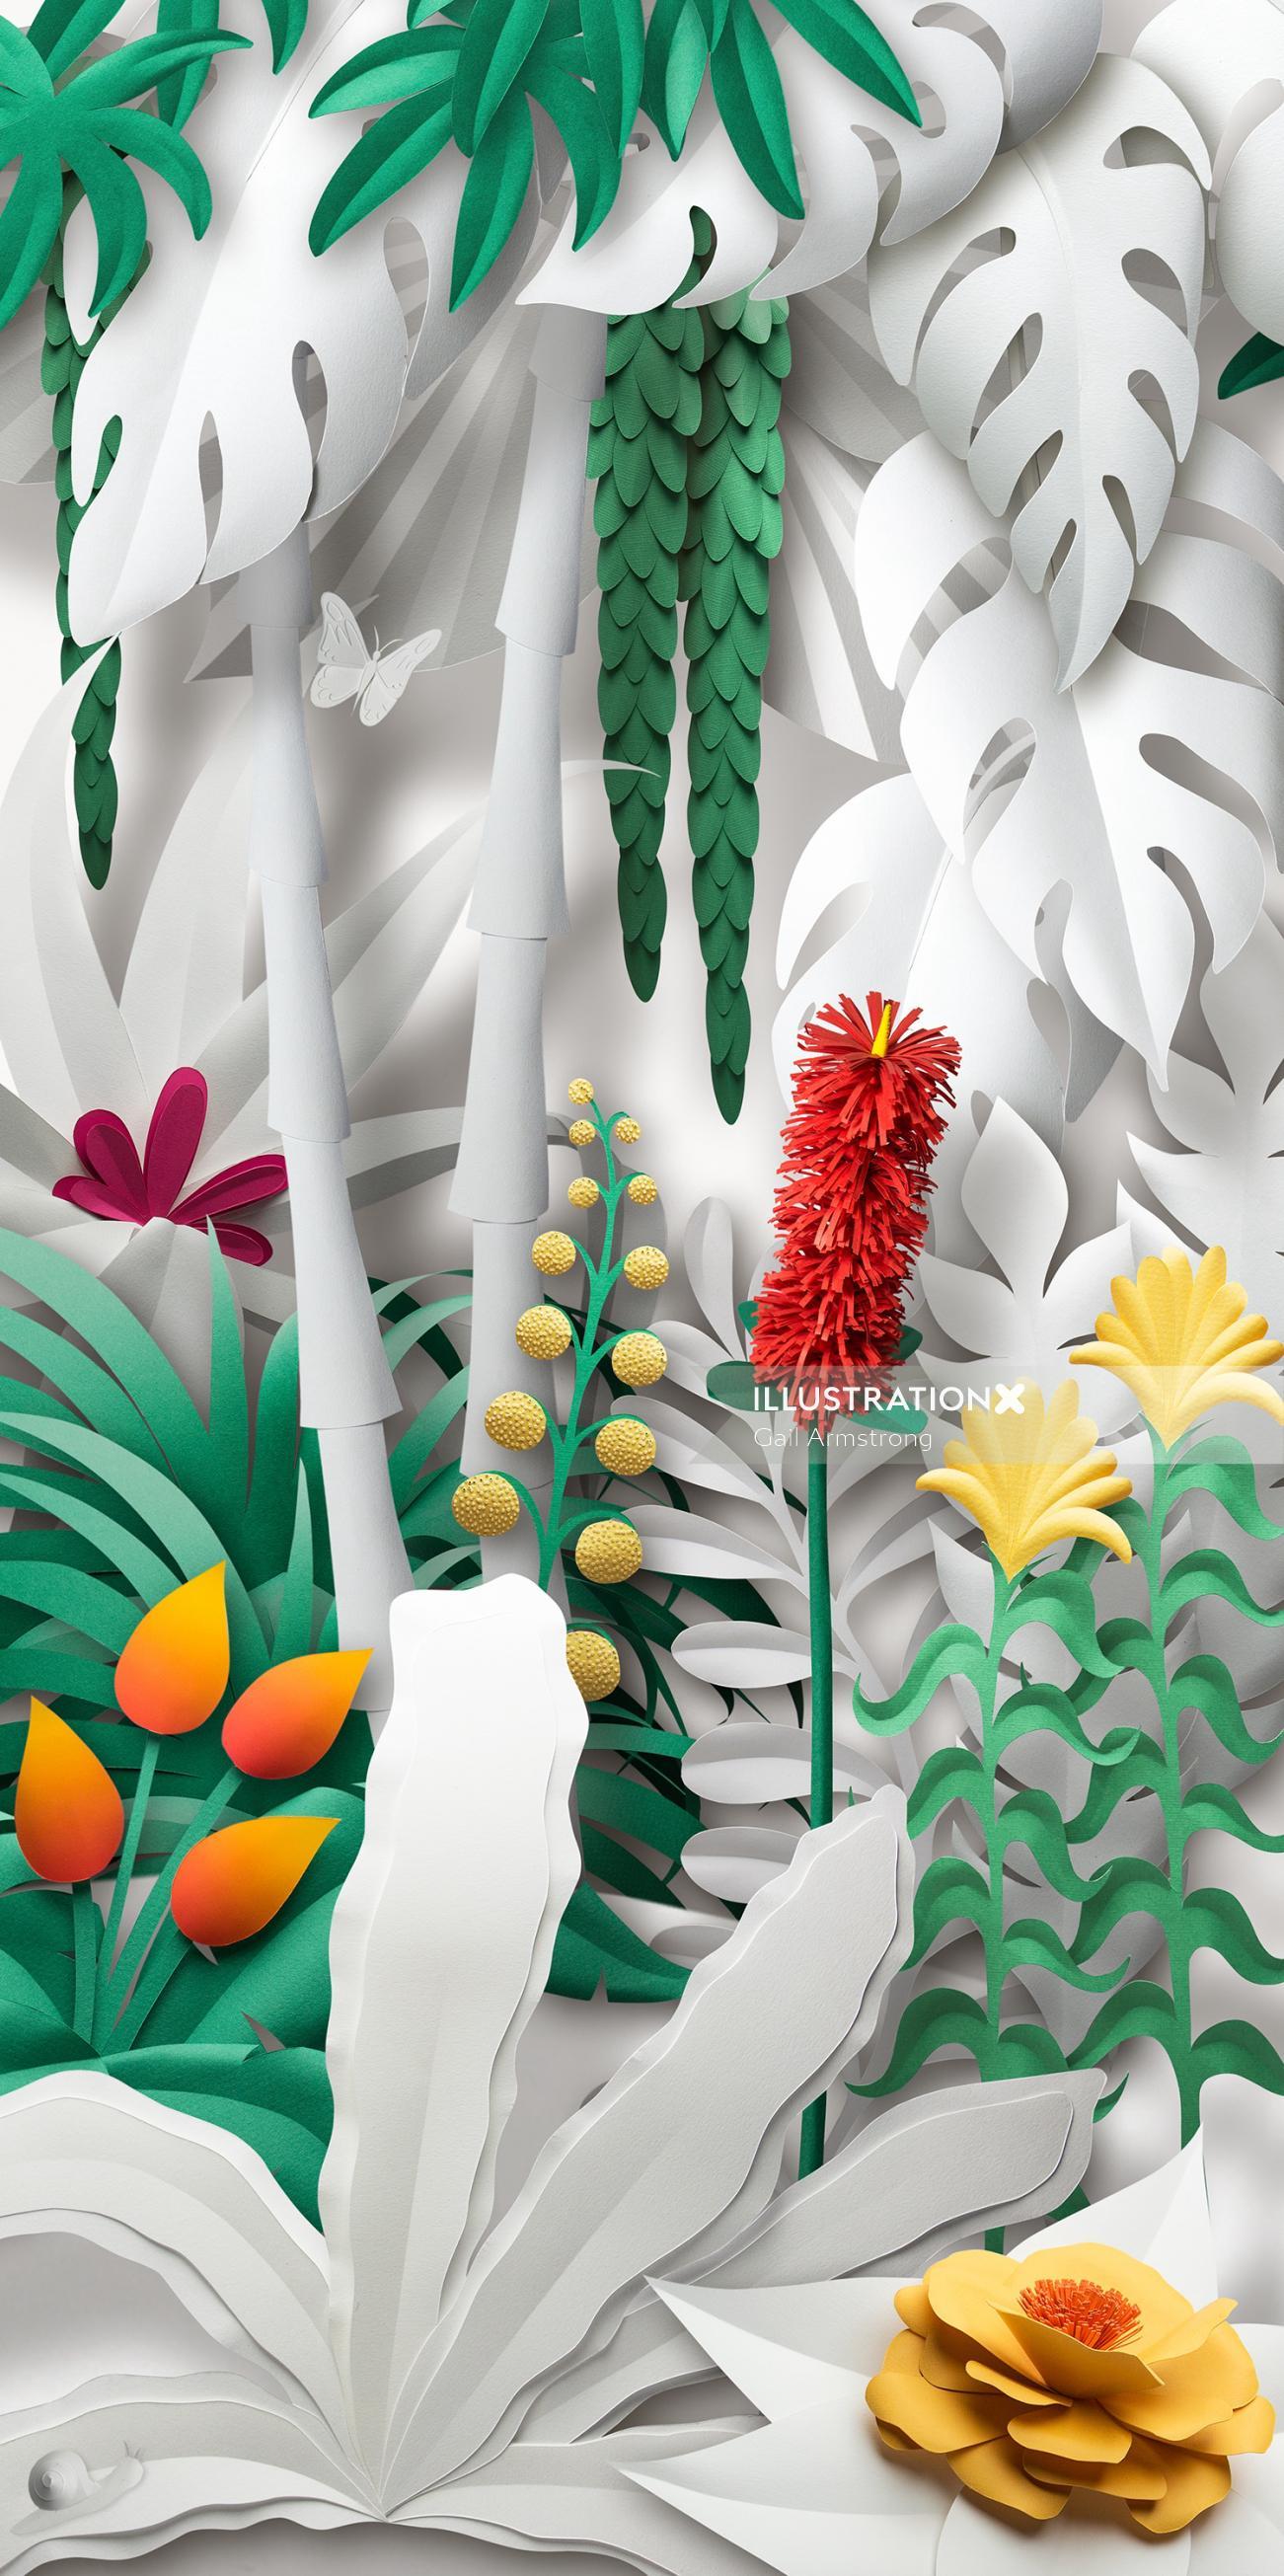 Nature Illustration of garden